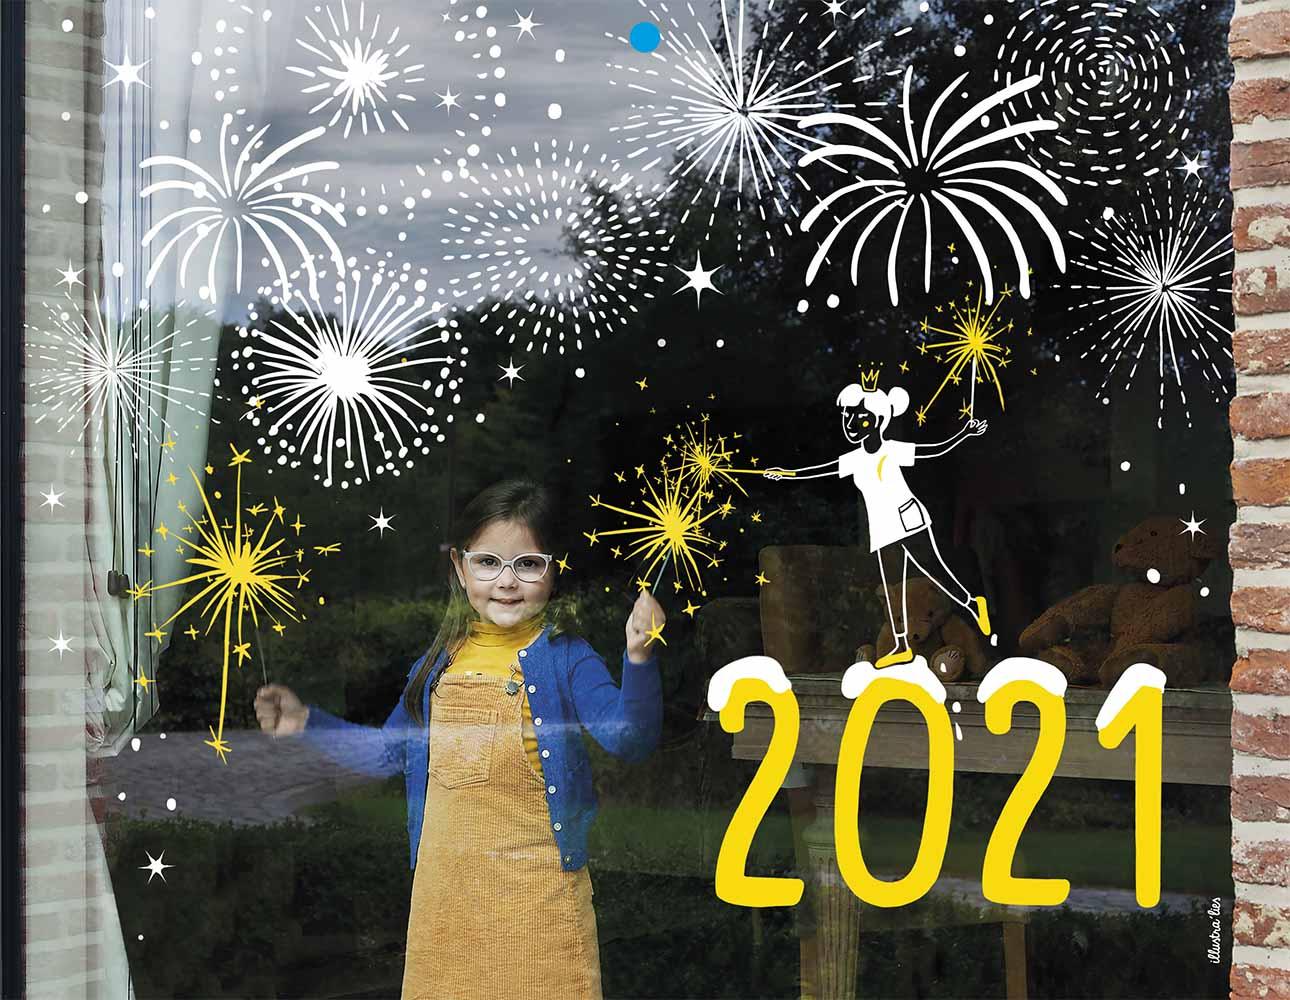 raamtekening illustraties voor kalender voor Wit-Gele kruis - vuurwerk cover 2021 - illustra'lies